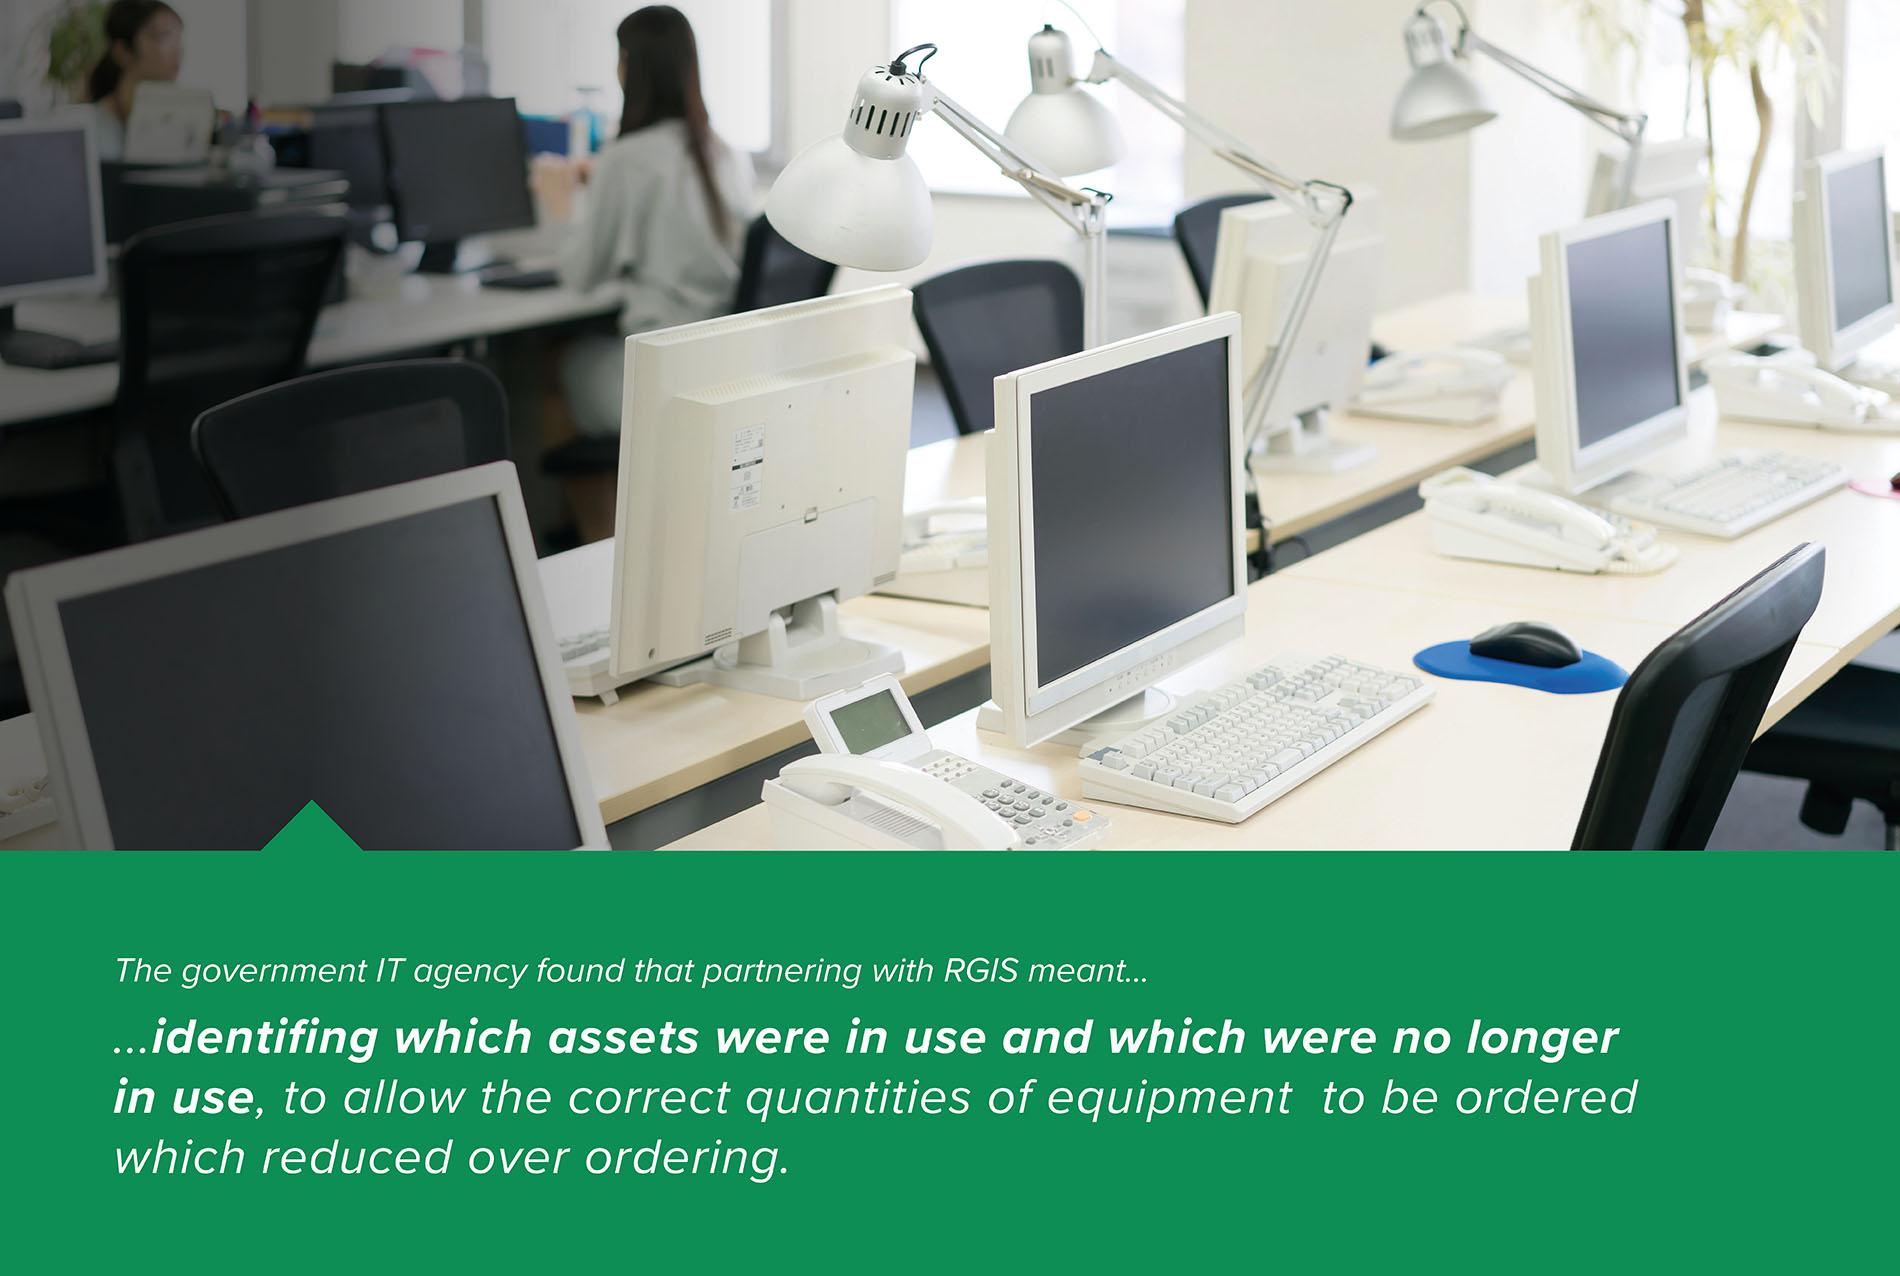 RGIS Case Study of Verification of IT Assets